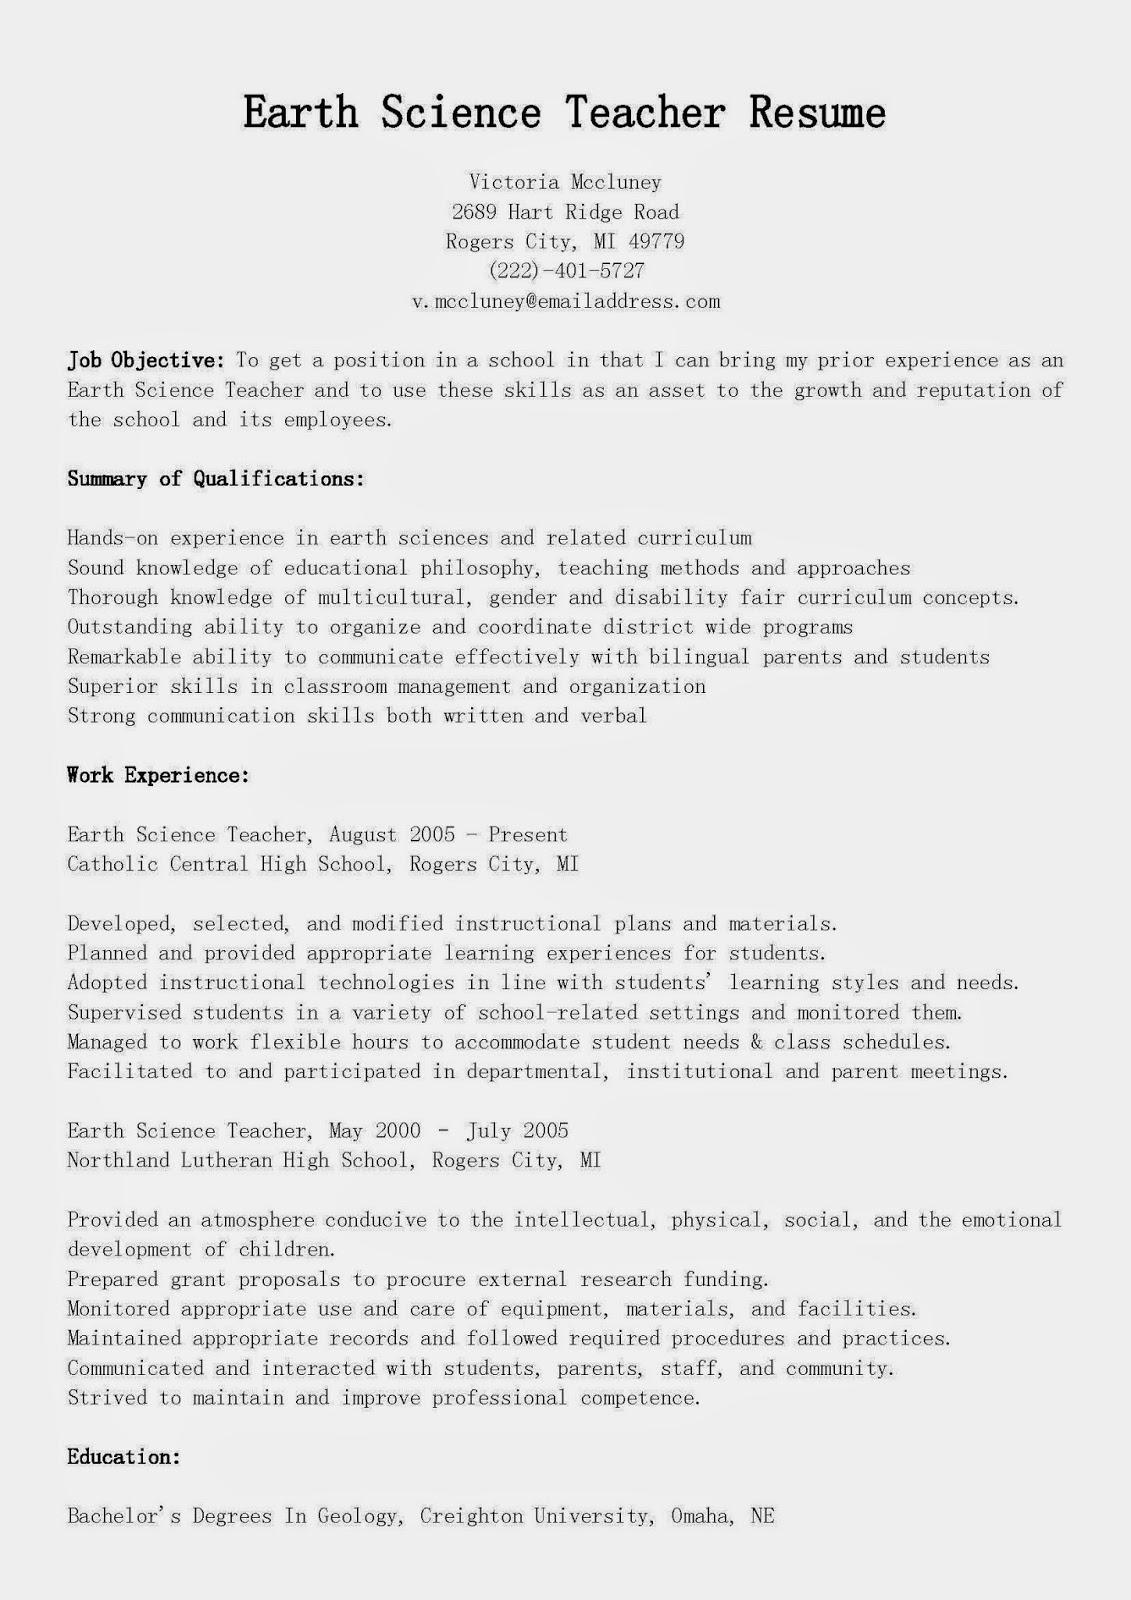 Science Teacher CV